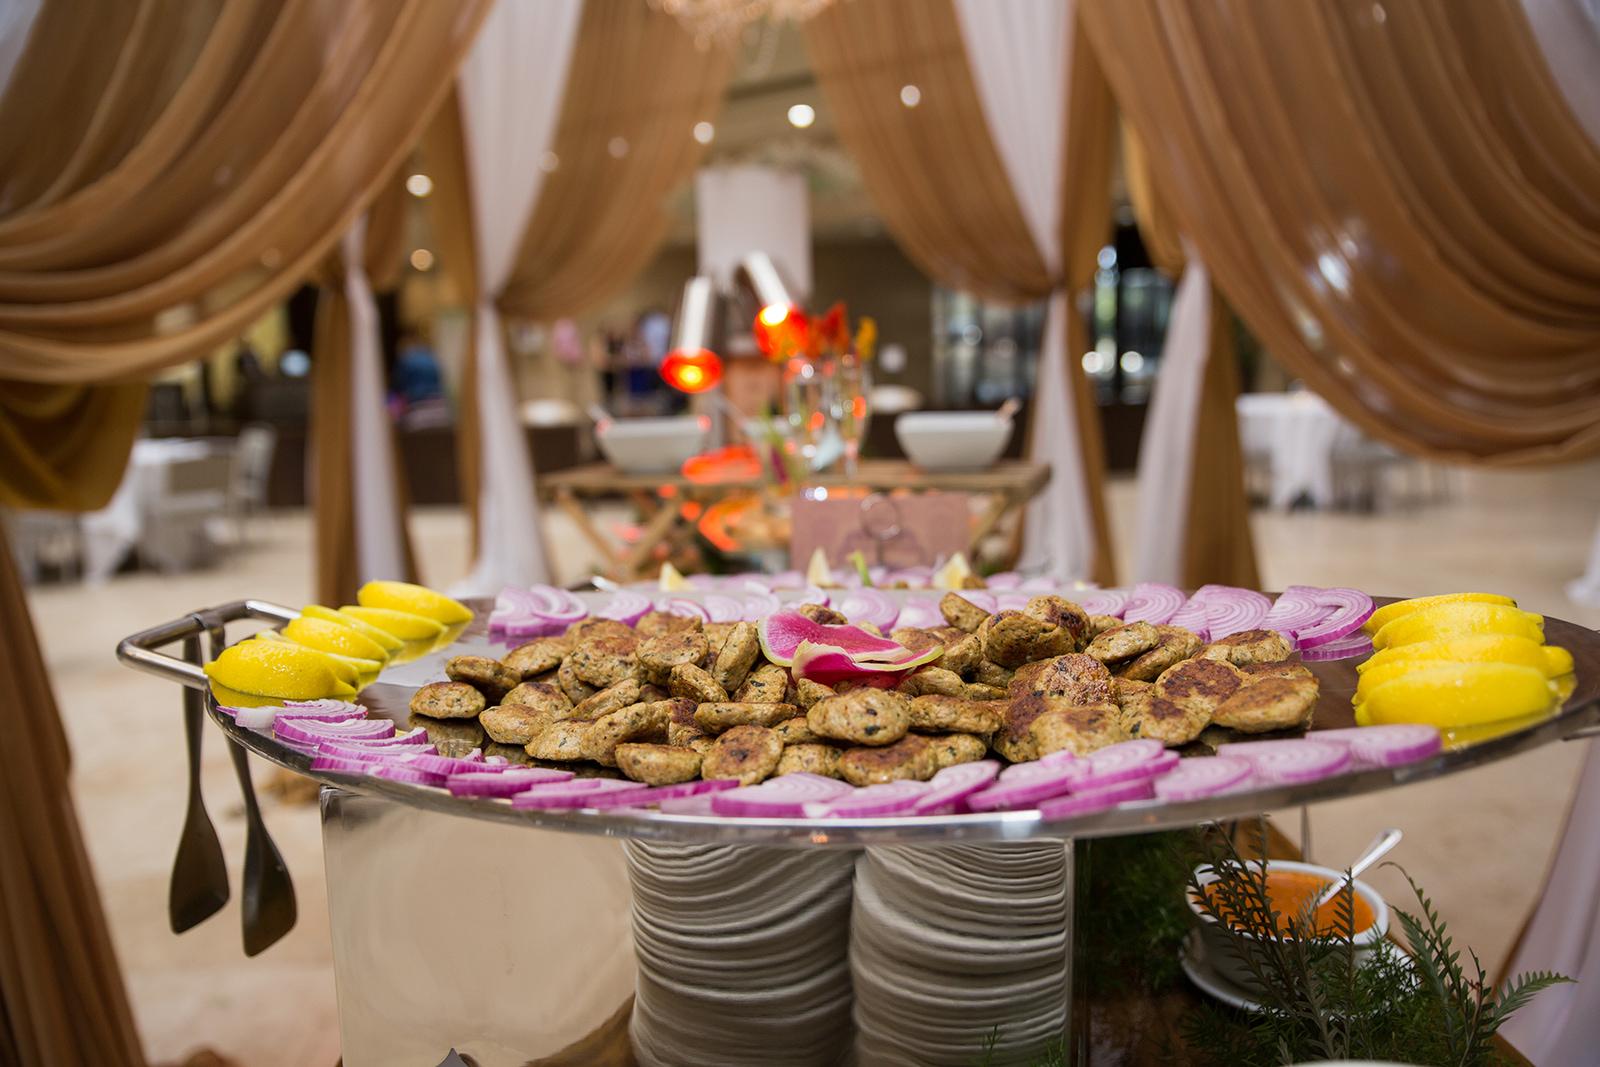 Le Cape Weddings - Sumeet and Chavi - Reception Details  -1.jpg